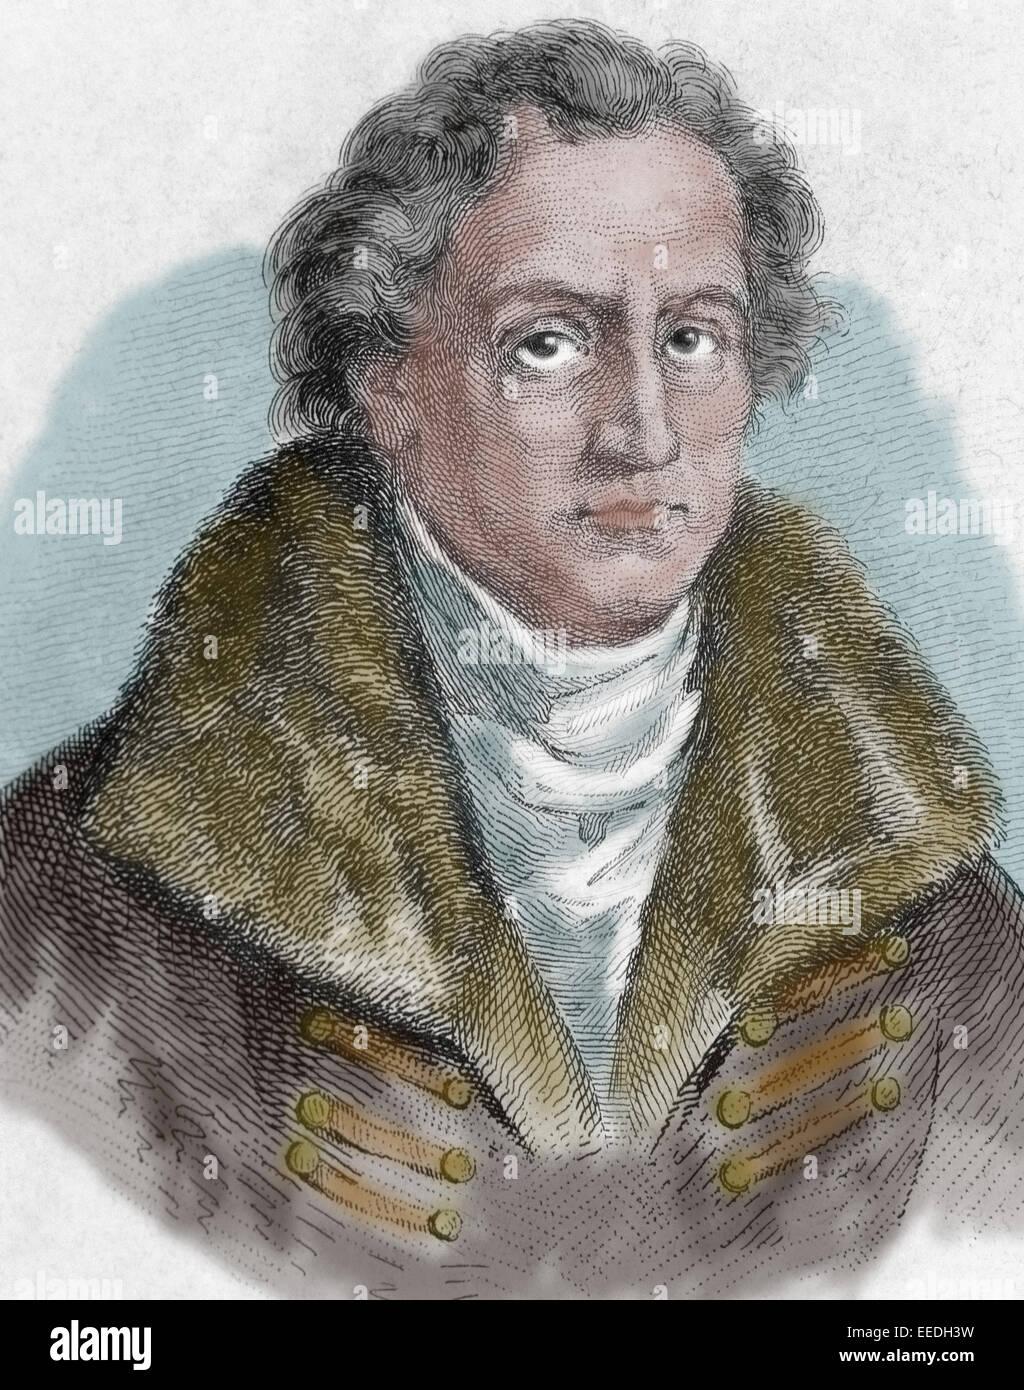 Johann Wolfgang von Goethe (1749-1832). German writer. Literary movement, Weimar Classicism. Engraving, 19th C. - Stock Image